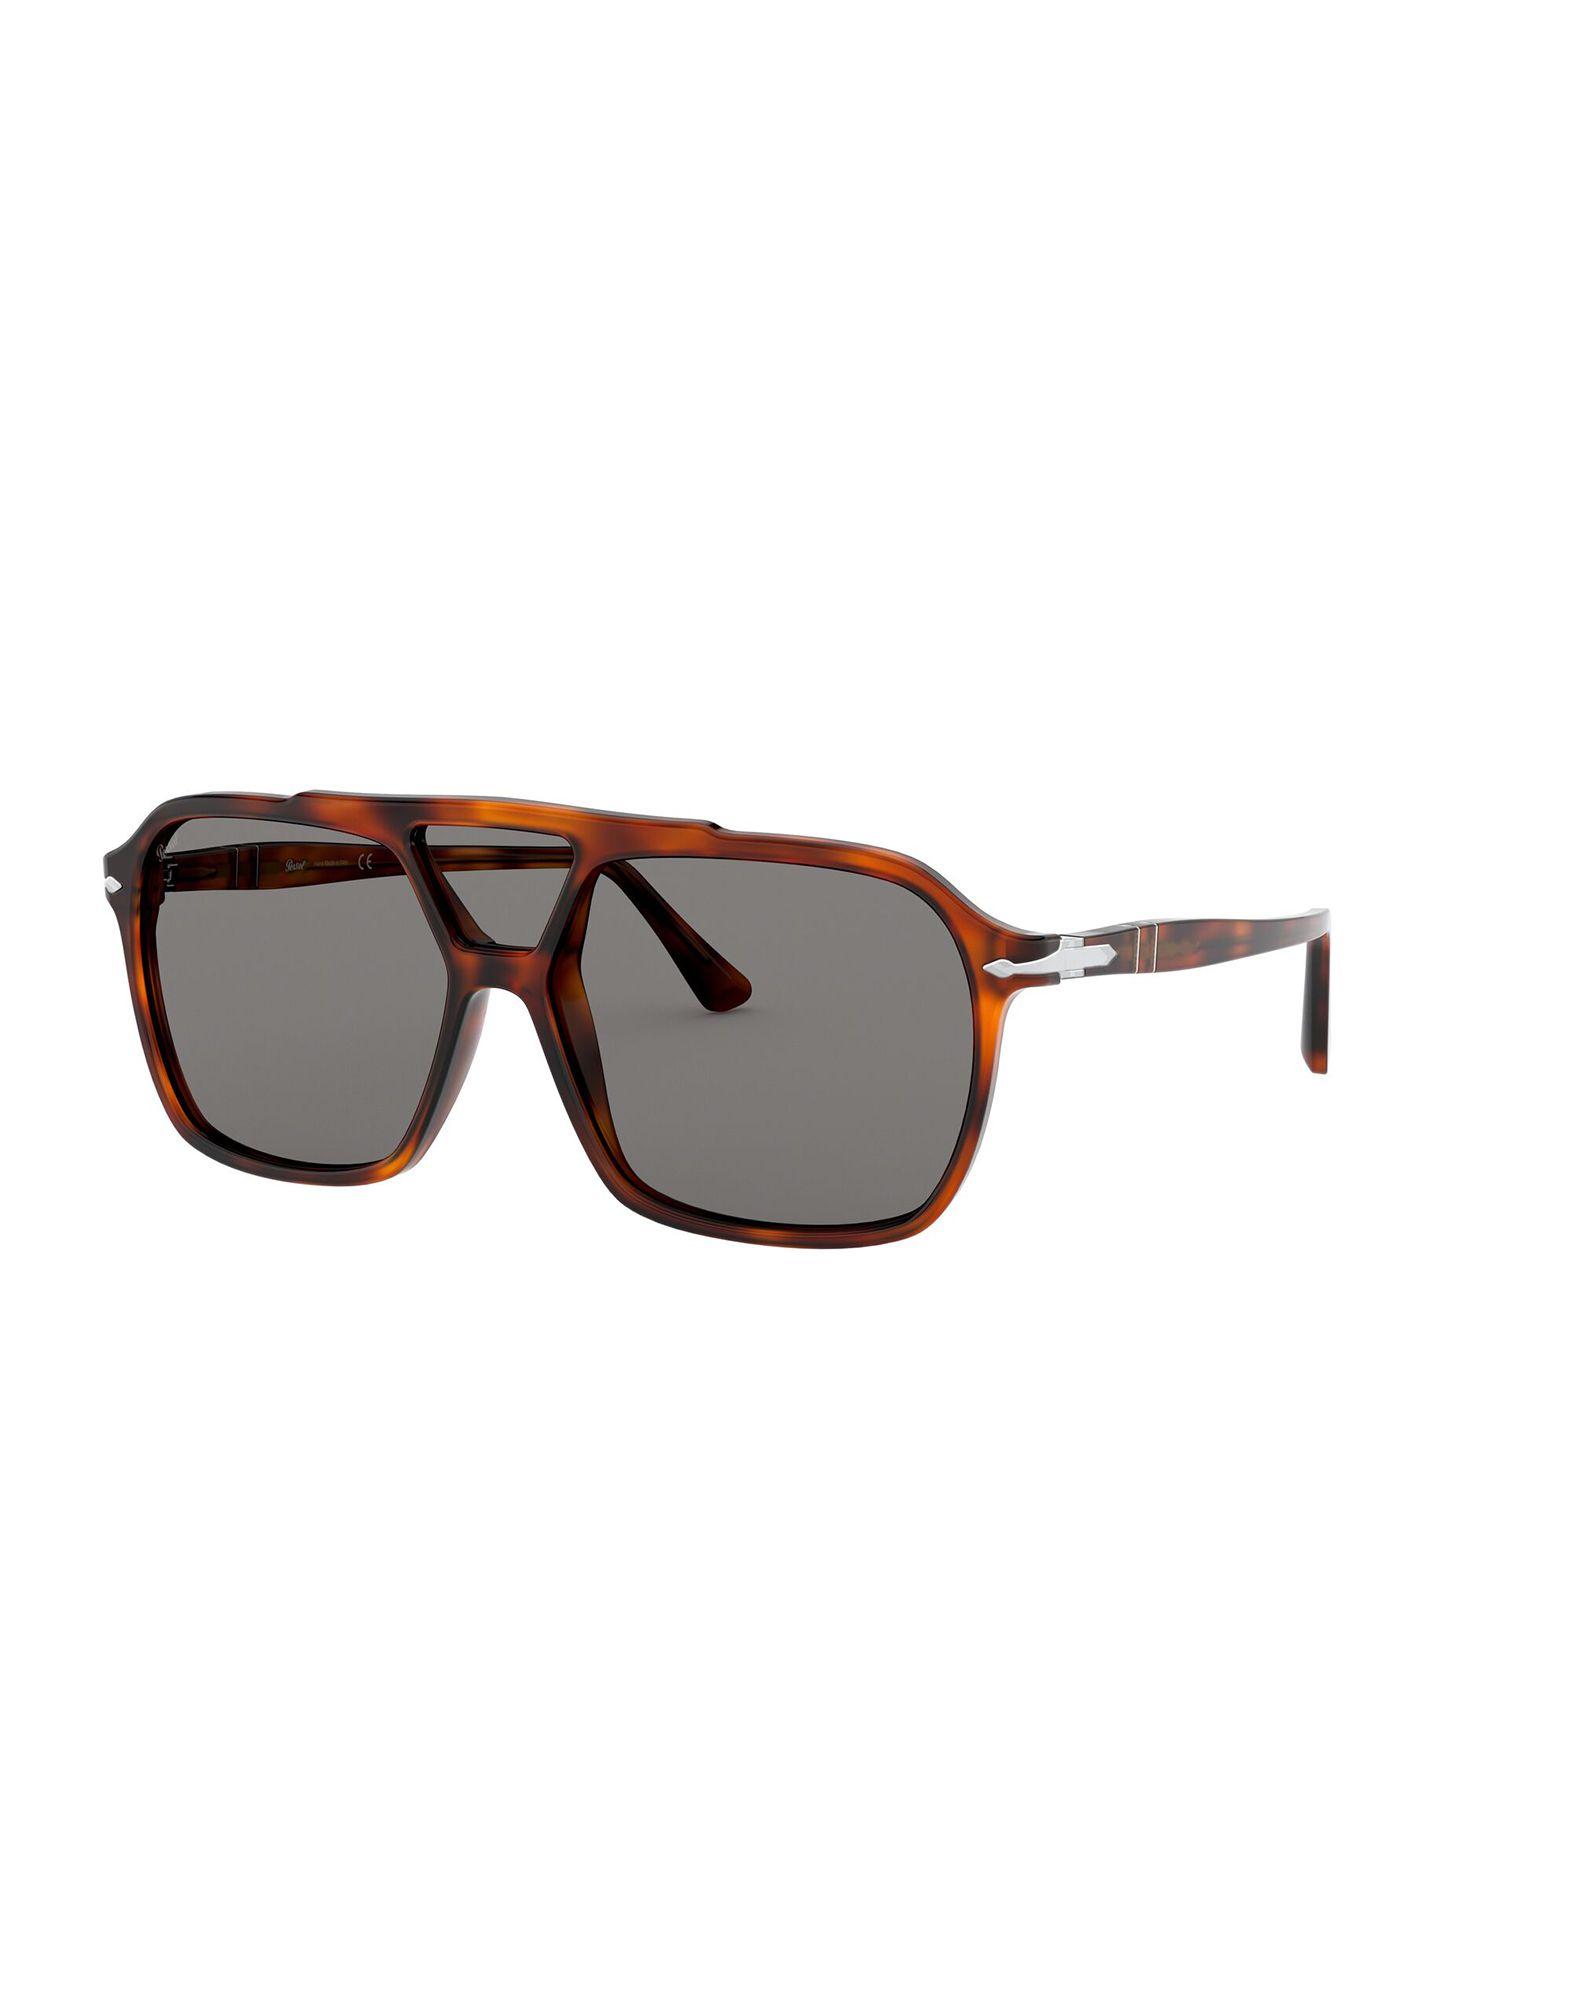 Фото - PERSOL Солнечные очки 3d очки